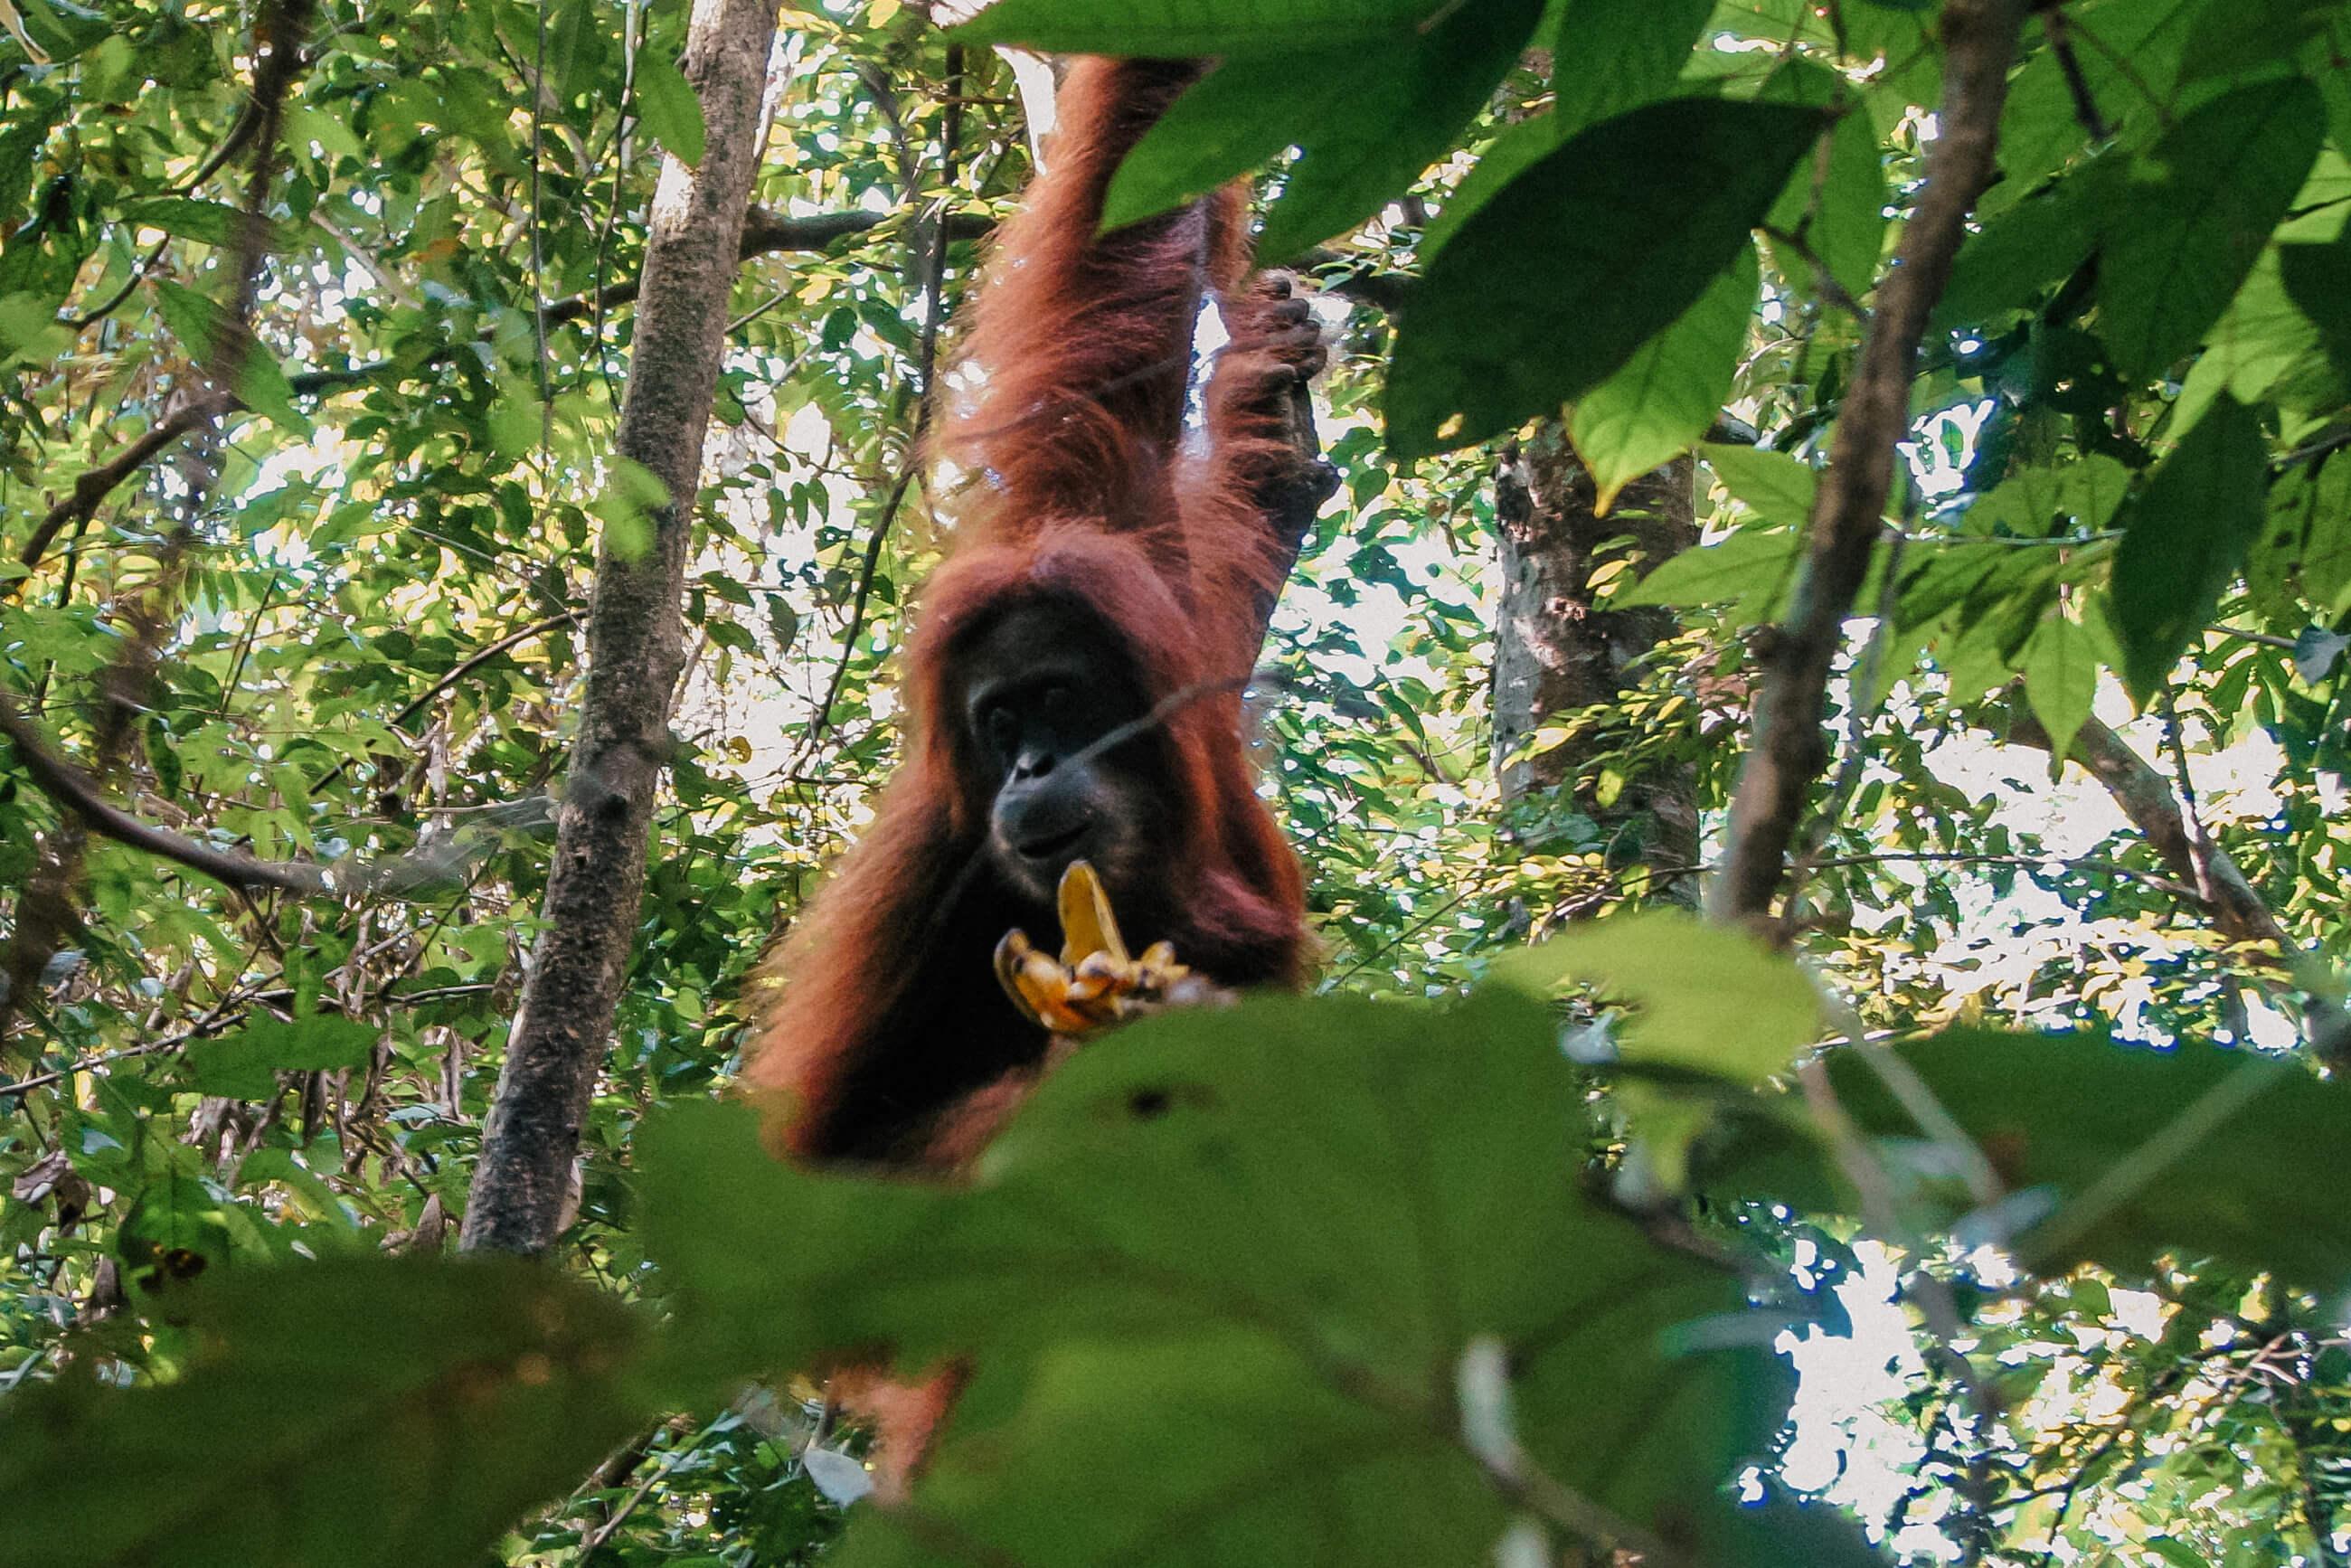 https://bubo.sk/uploads/galleries/7542/jozefharvanek_indonezia_sumatra_026-orangutany-v-bukit-lawangu-3.jpg